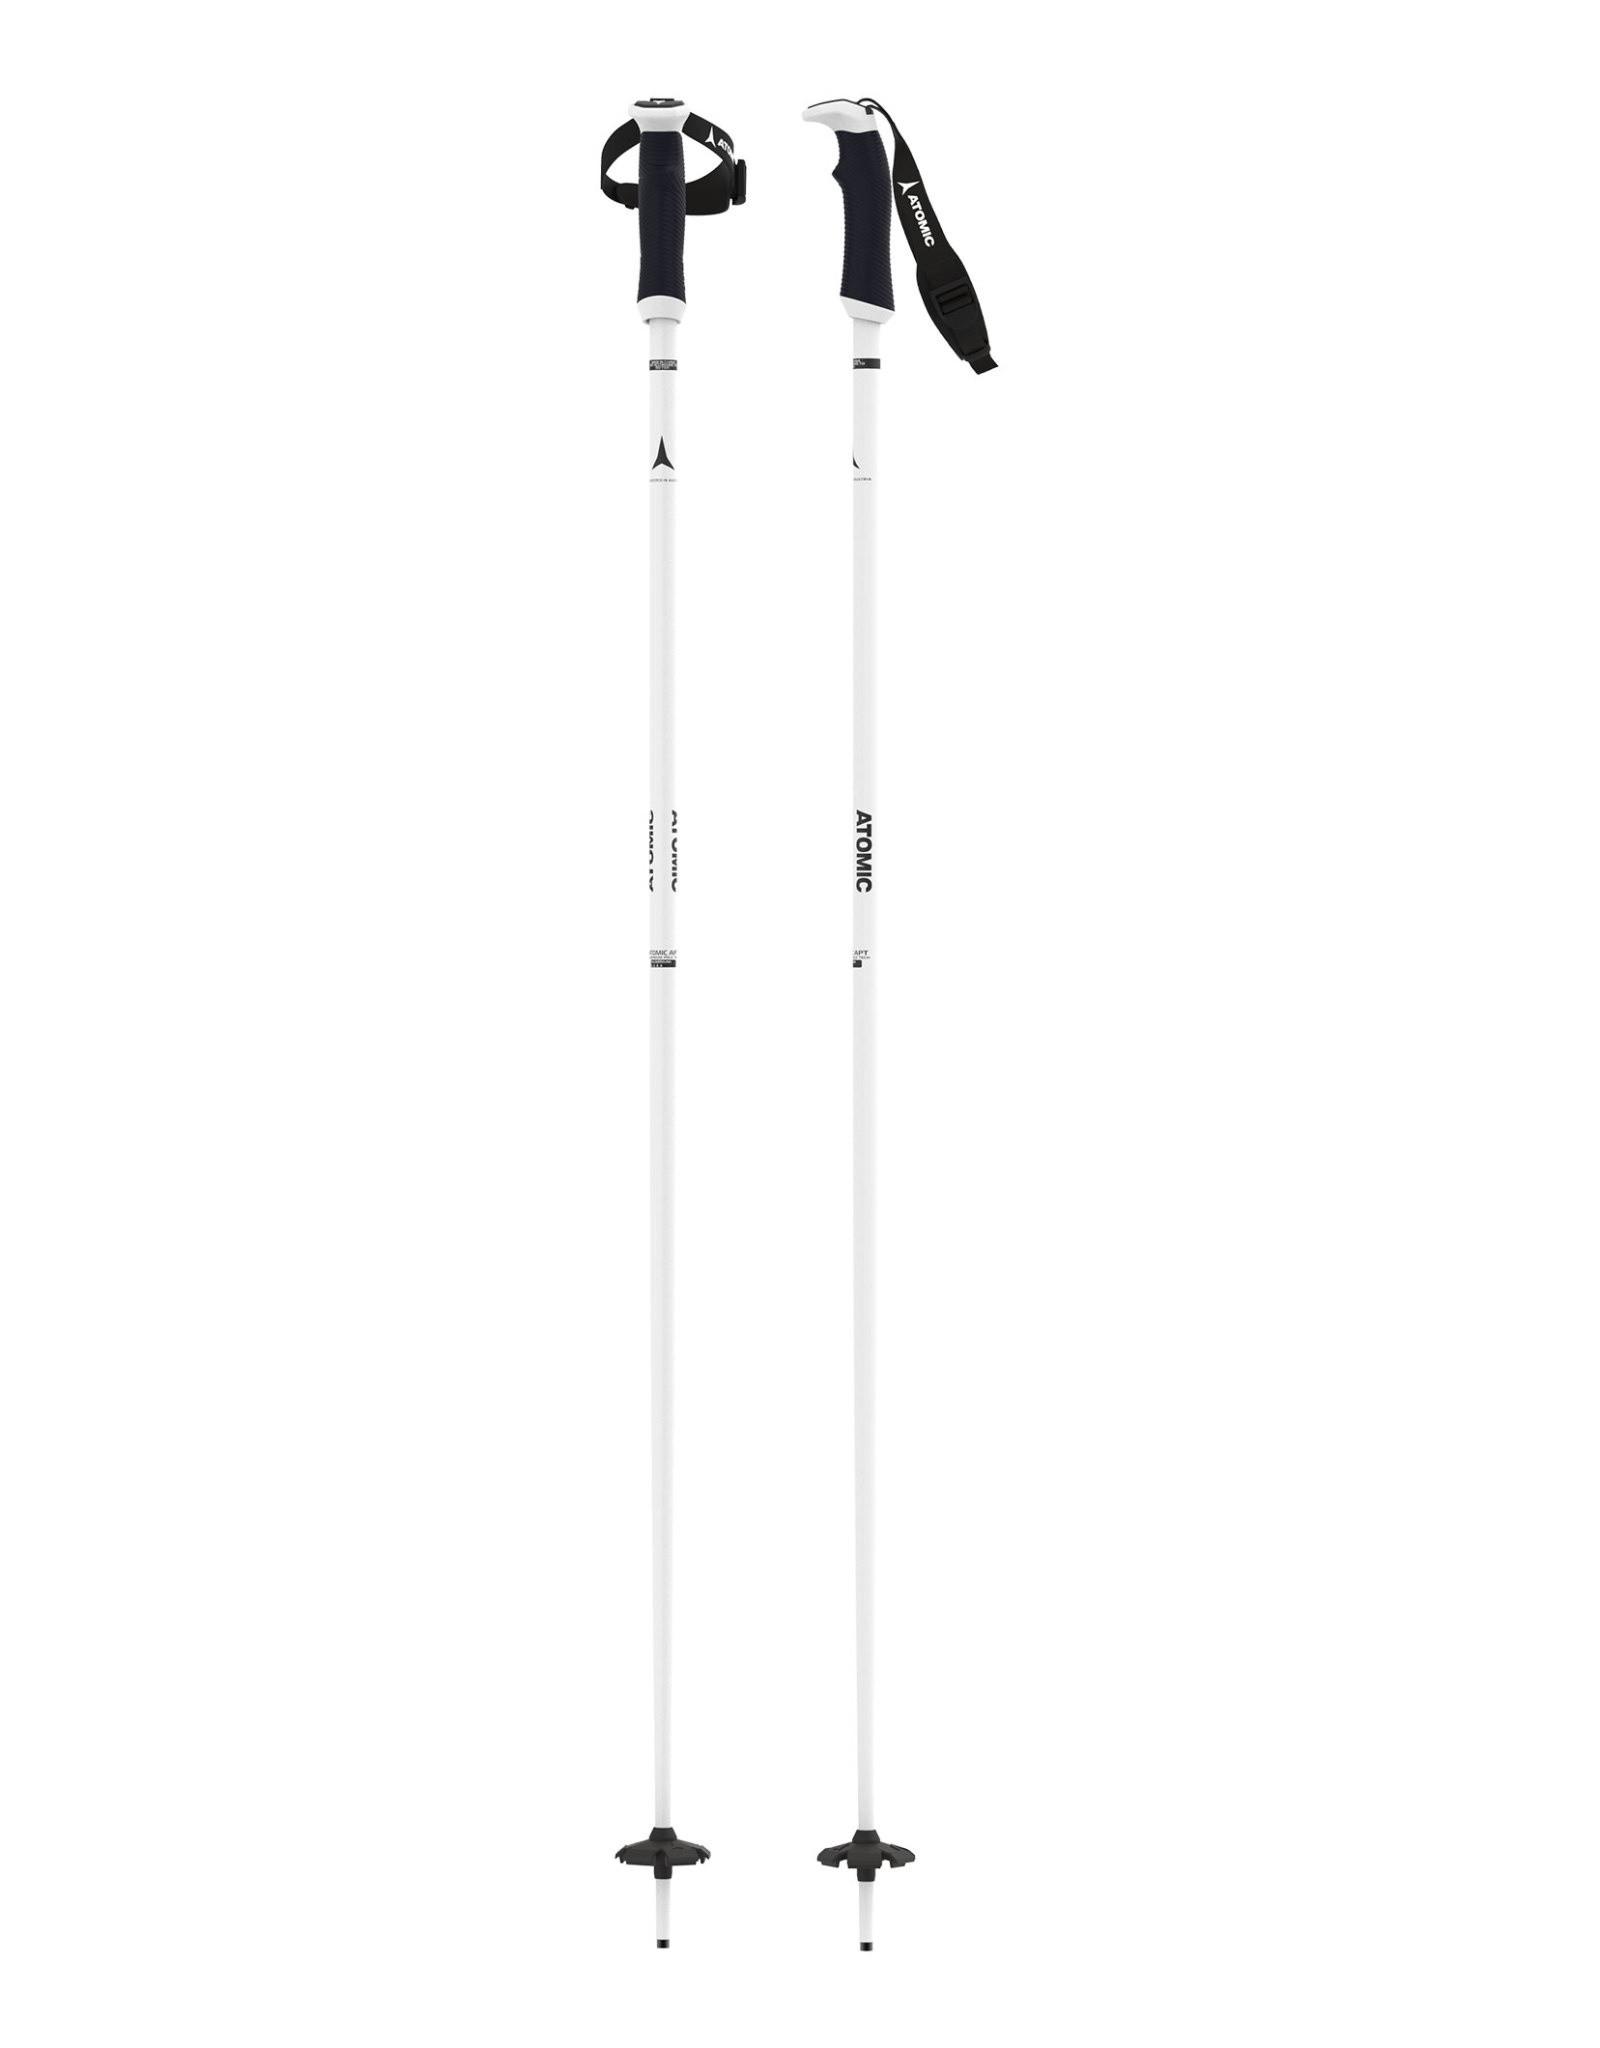 ATOMIC ATOMIC Ski Poles AMT SQS W (20/21)